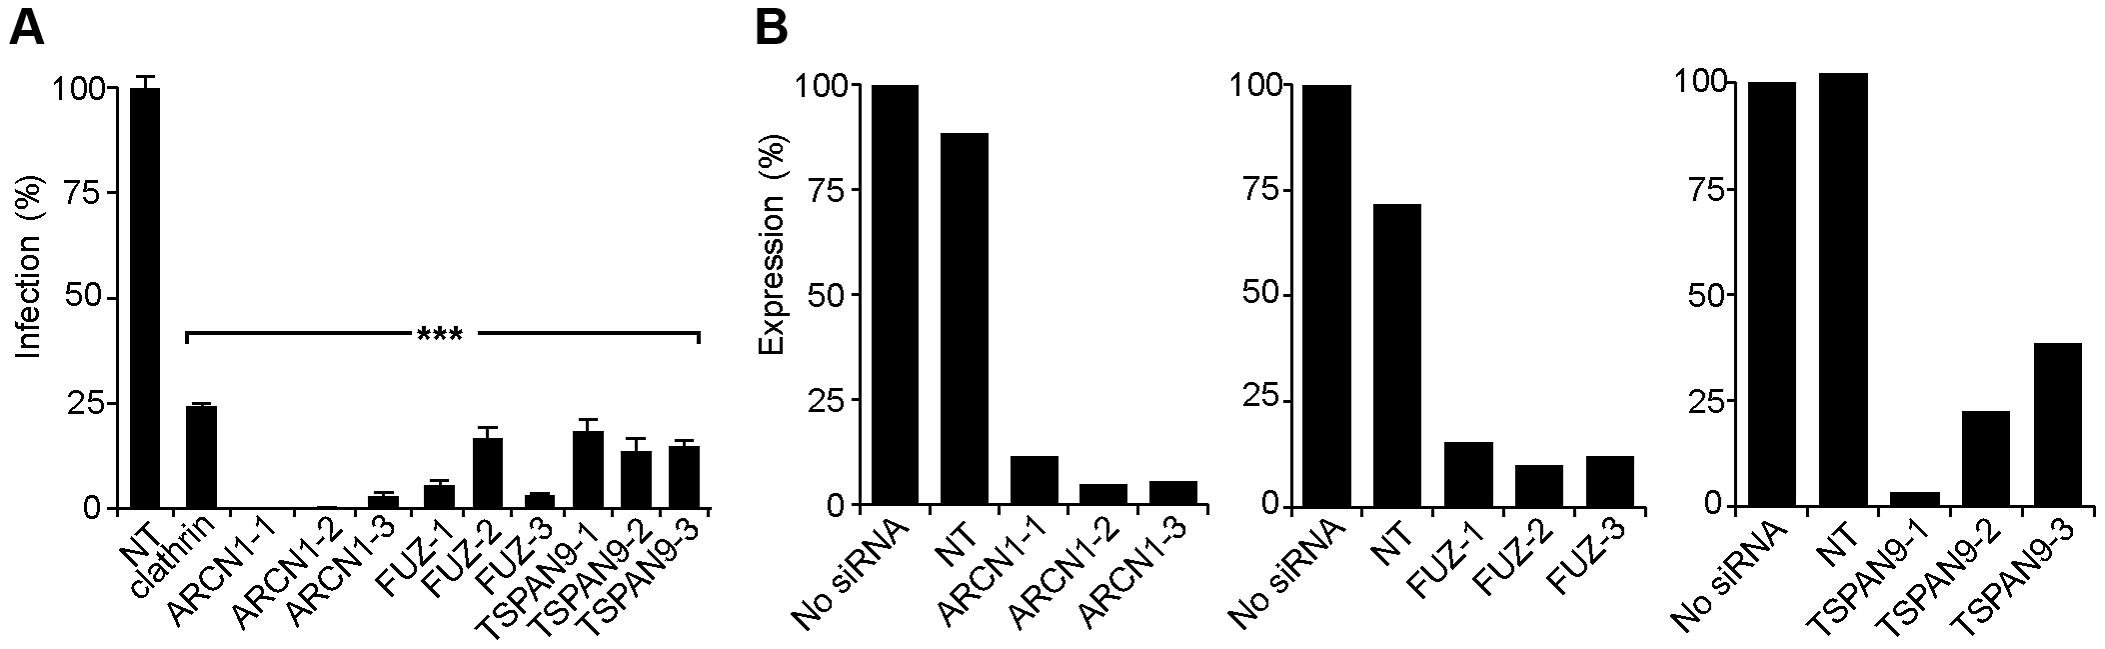 Silencing of ARCN1, FUZ, and TSPAN9 in human U-2 OS cells inhibits alphavirus infection.